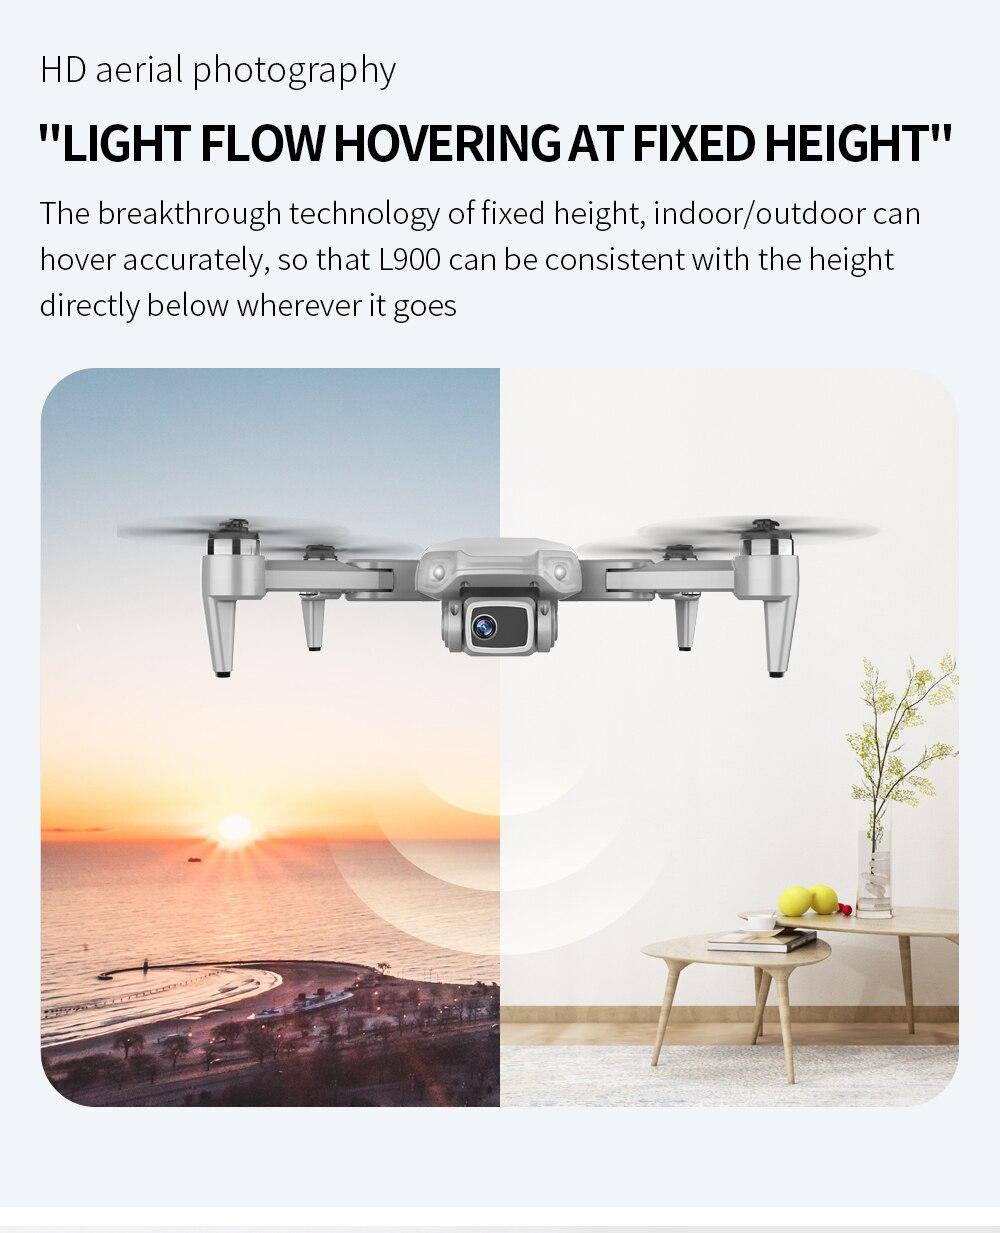 Ha2d920364306487197dee2f45f8dcd97P - L900 Pro Drone 4K Professional 5G WIFI GPS Dron With HD Camera FPV 28min Flight Time Brushless Motor Quadcopter Distance 1.2km